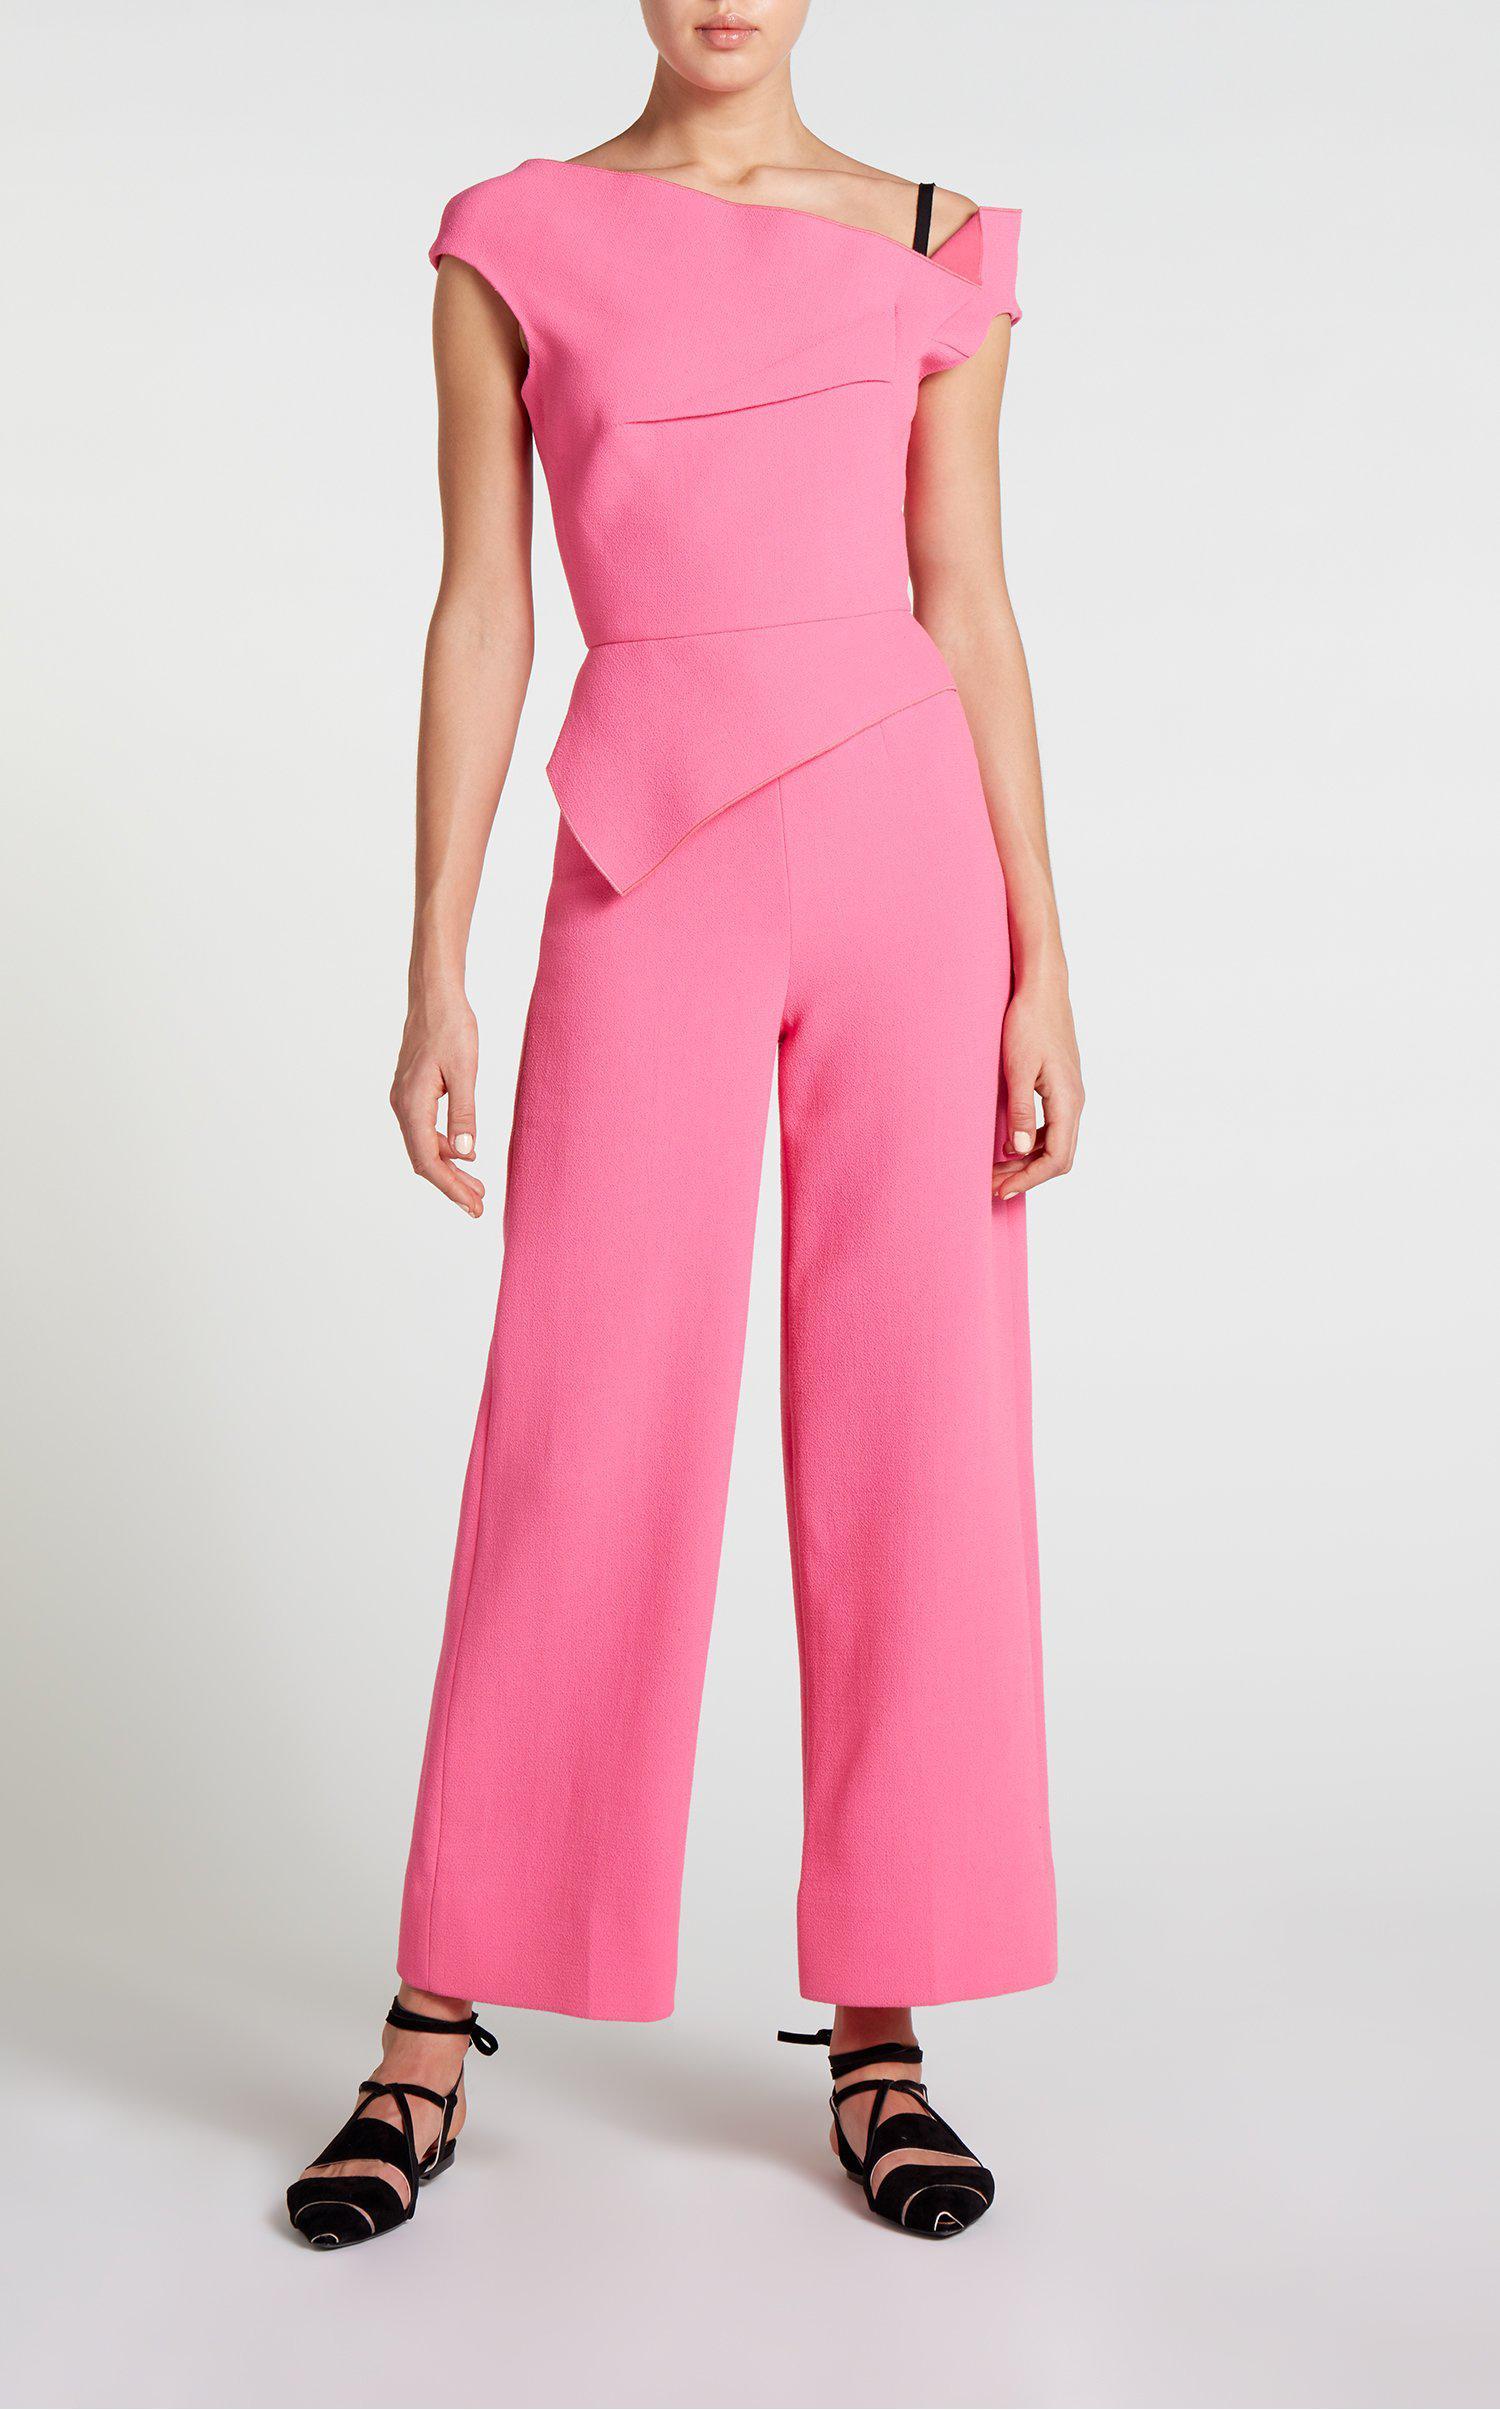 3007f1126629 Roland Mouret Gable Jumpsuit in Pink - Lyst